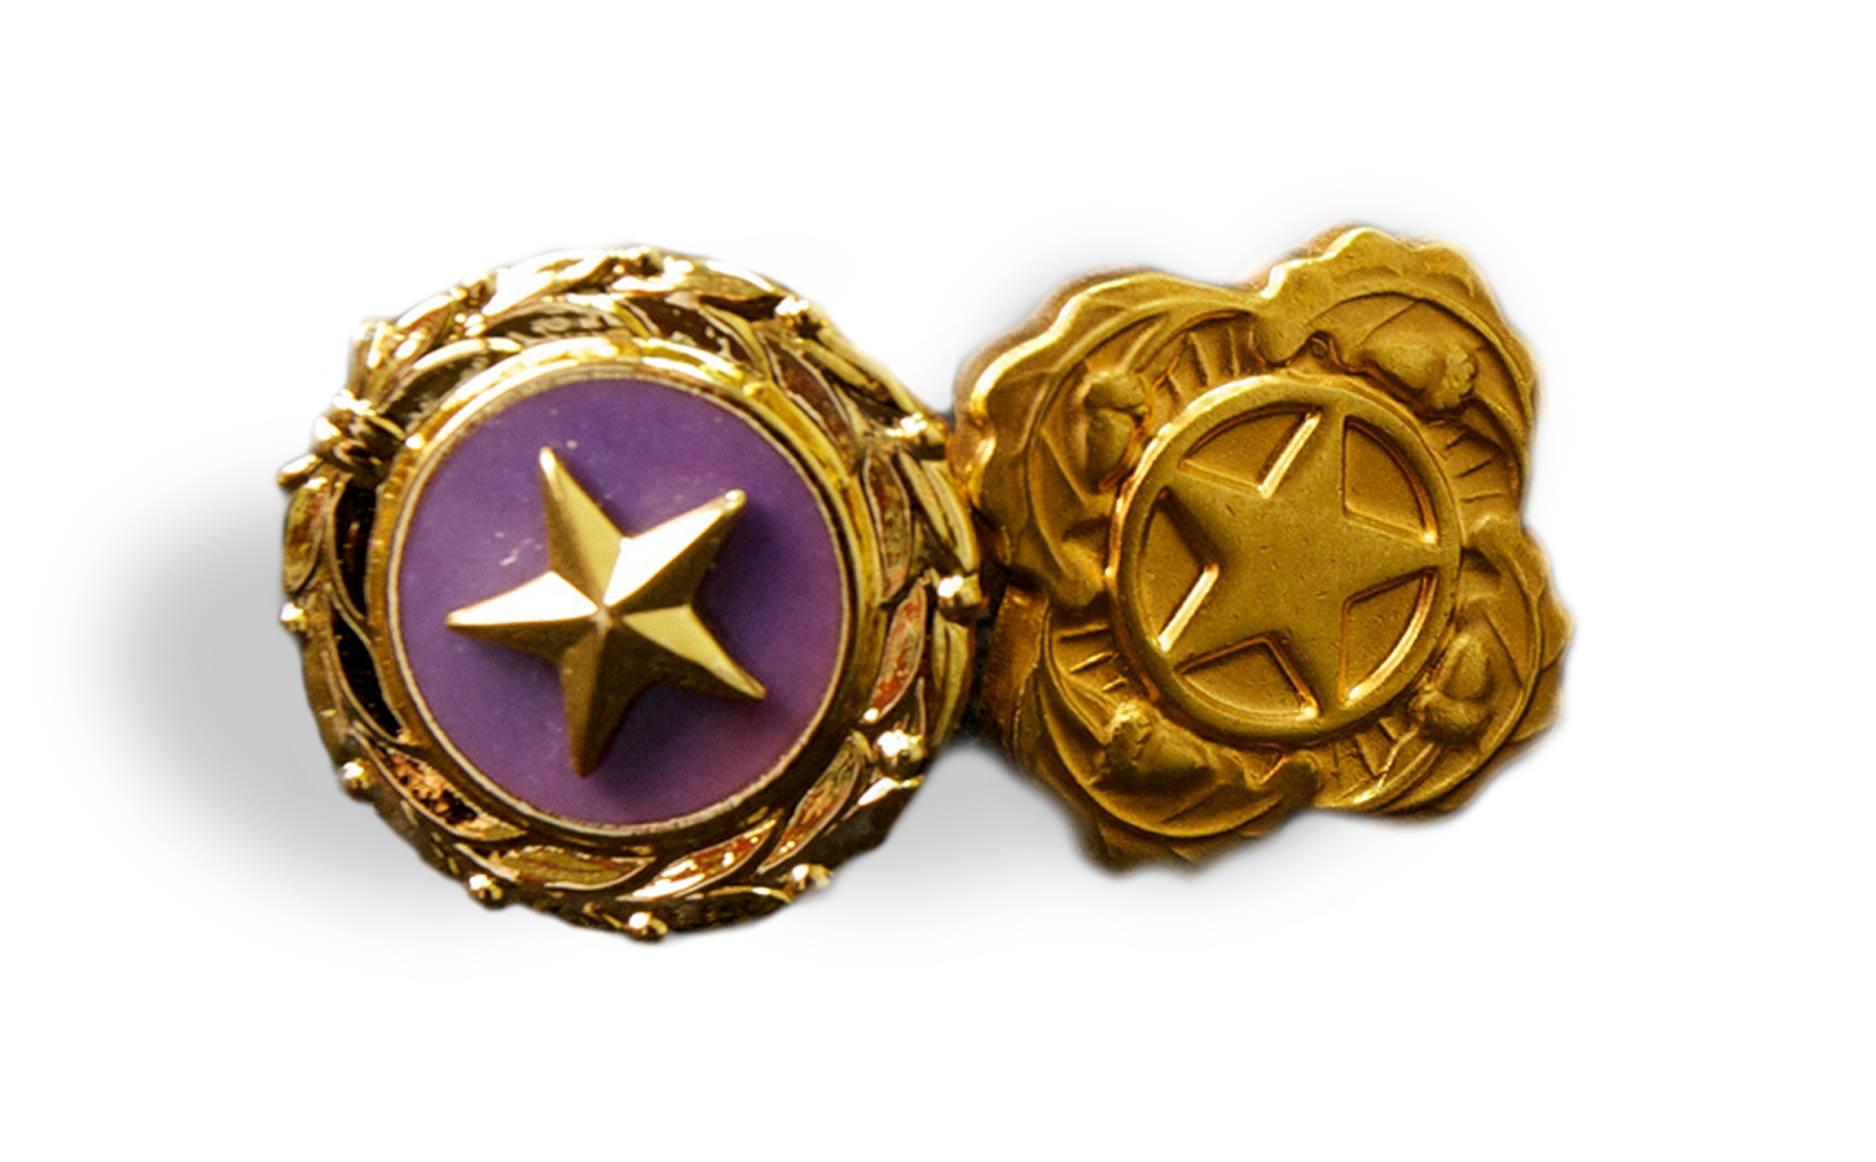 Gold Star Lapel Buttons | Military com